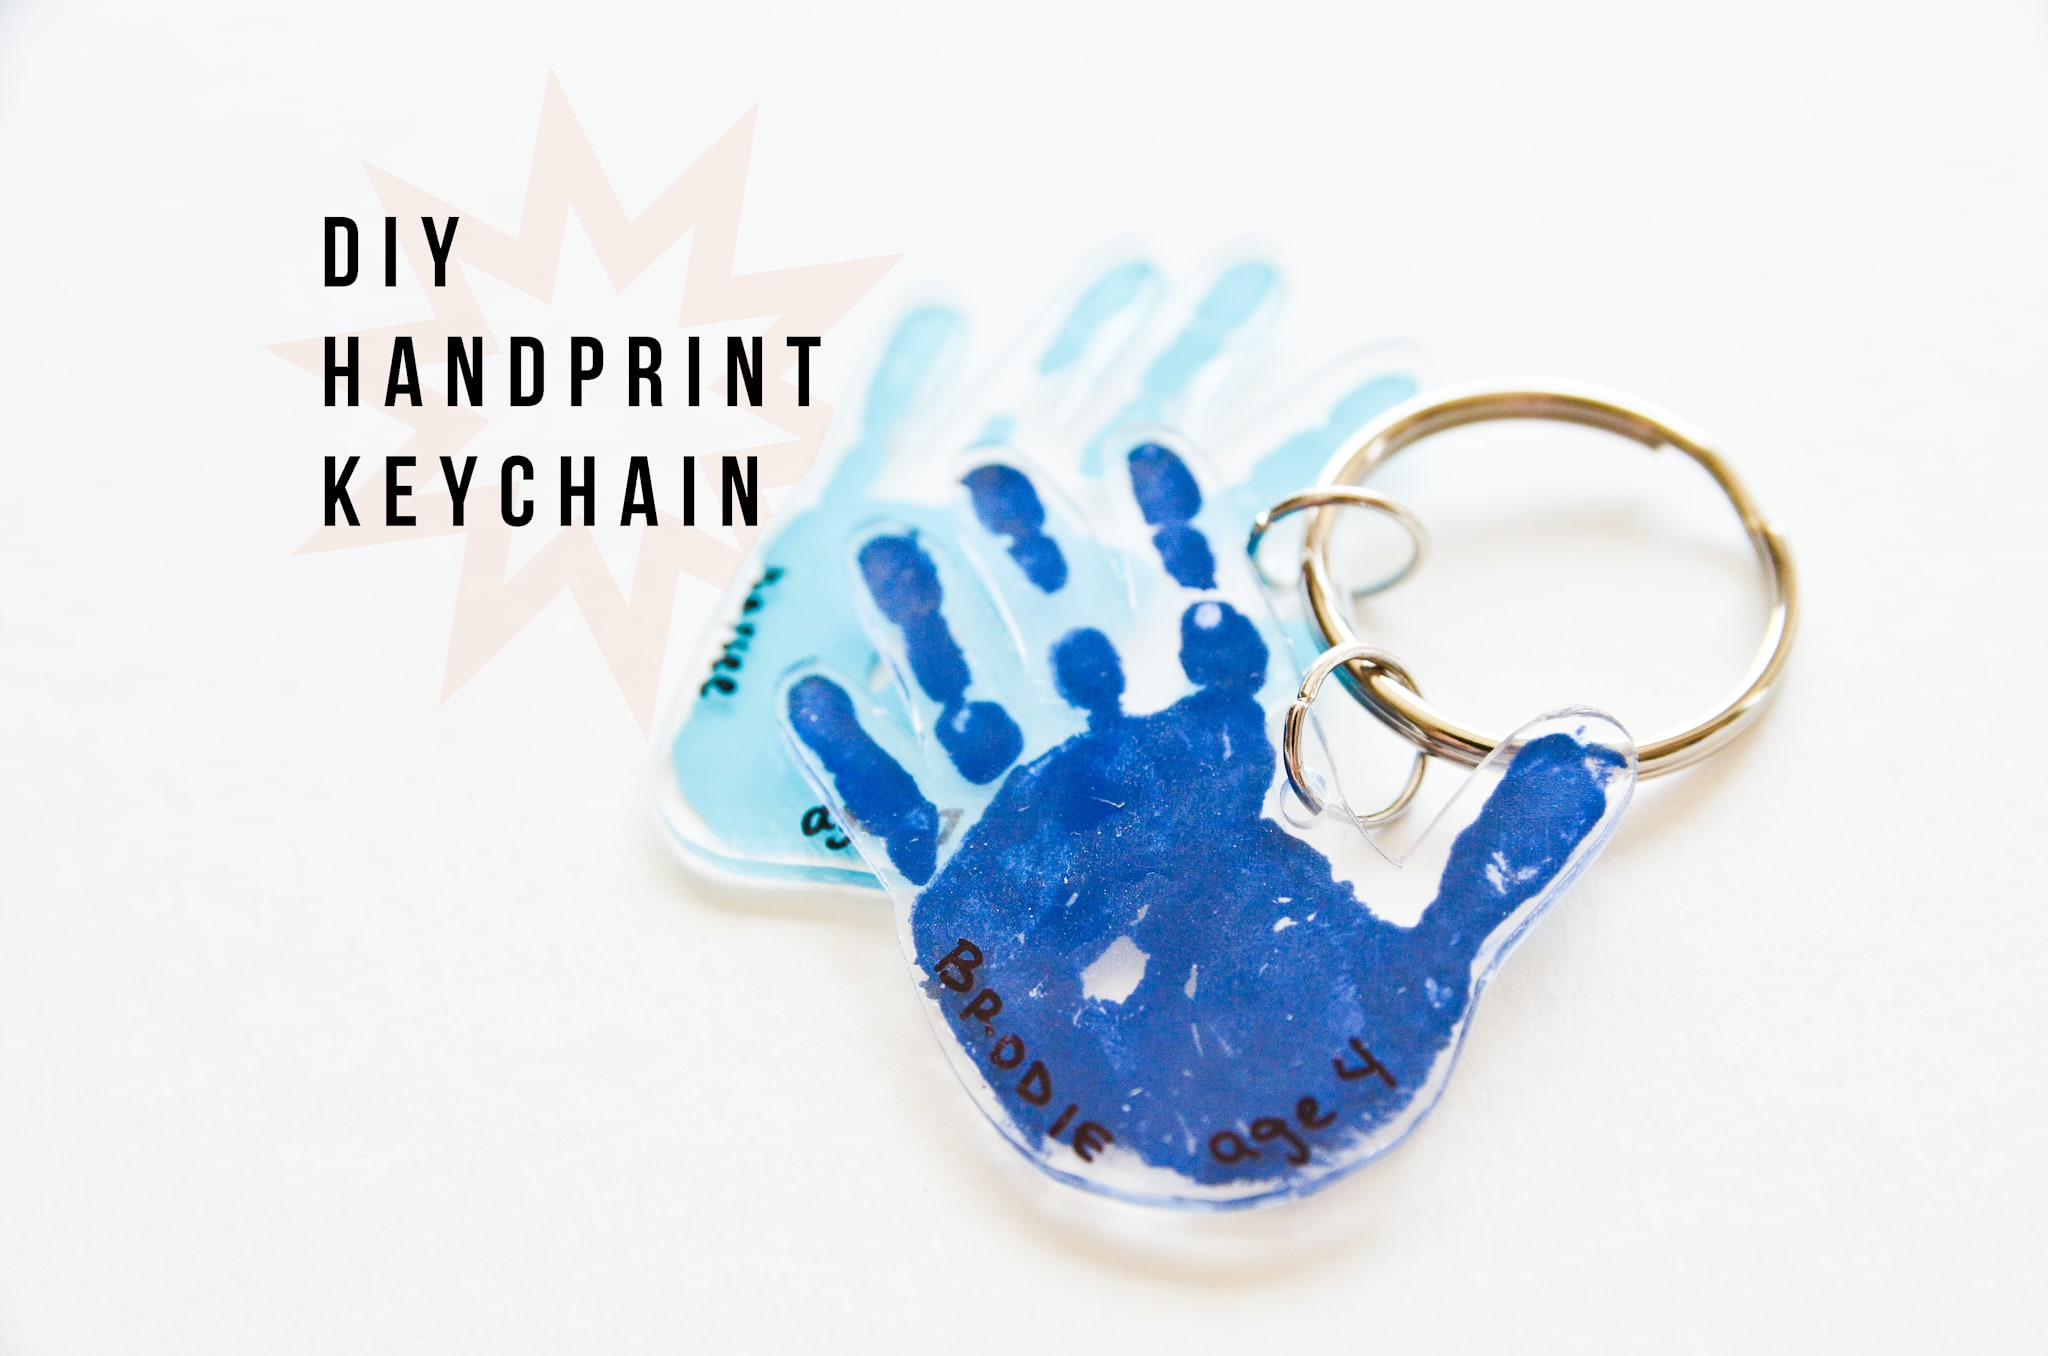 DIY Handprint Shrinky Dink Keychain